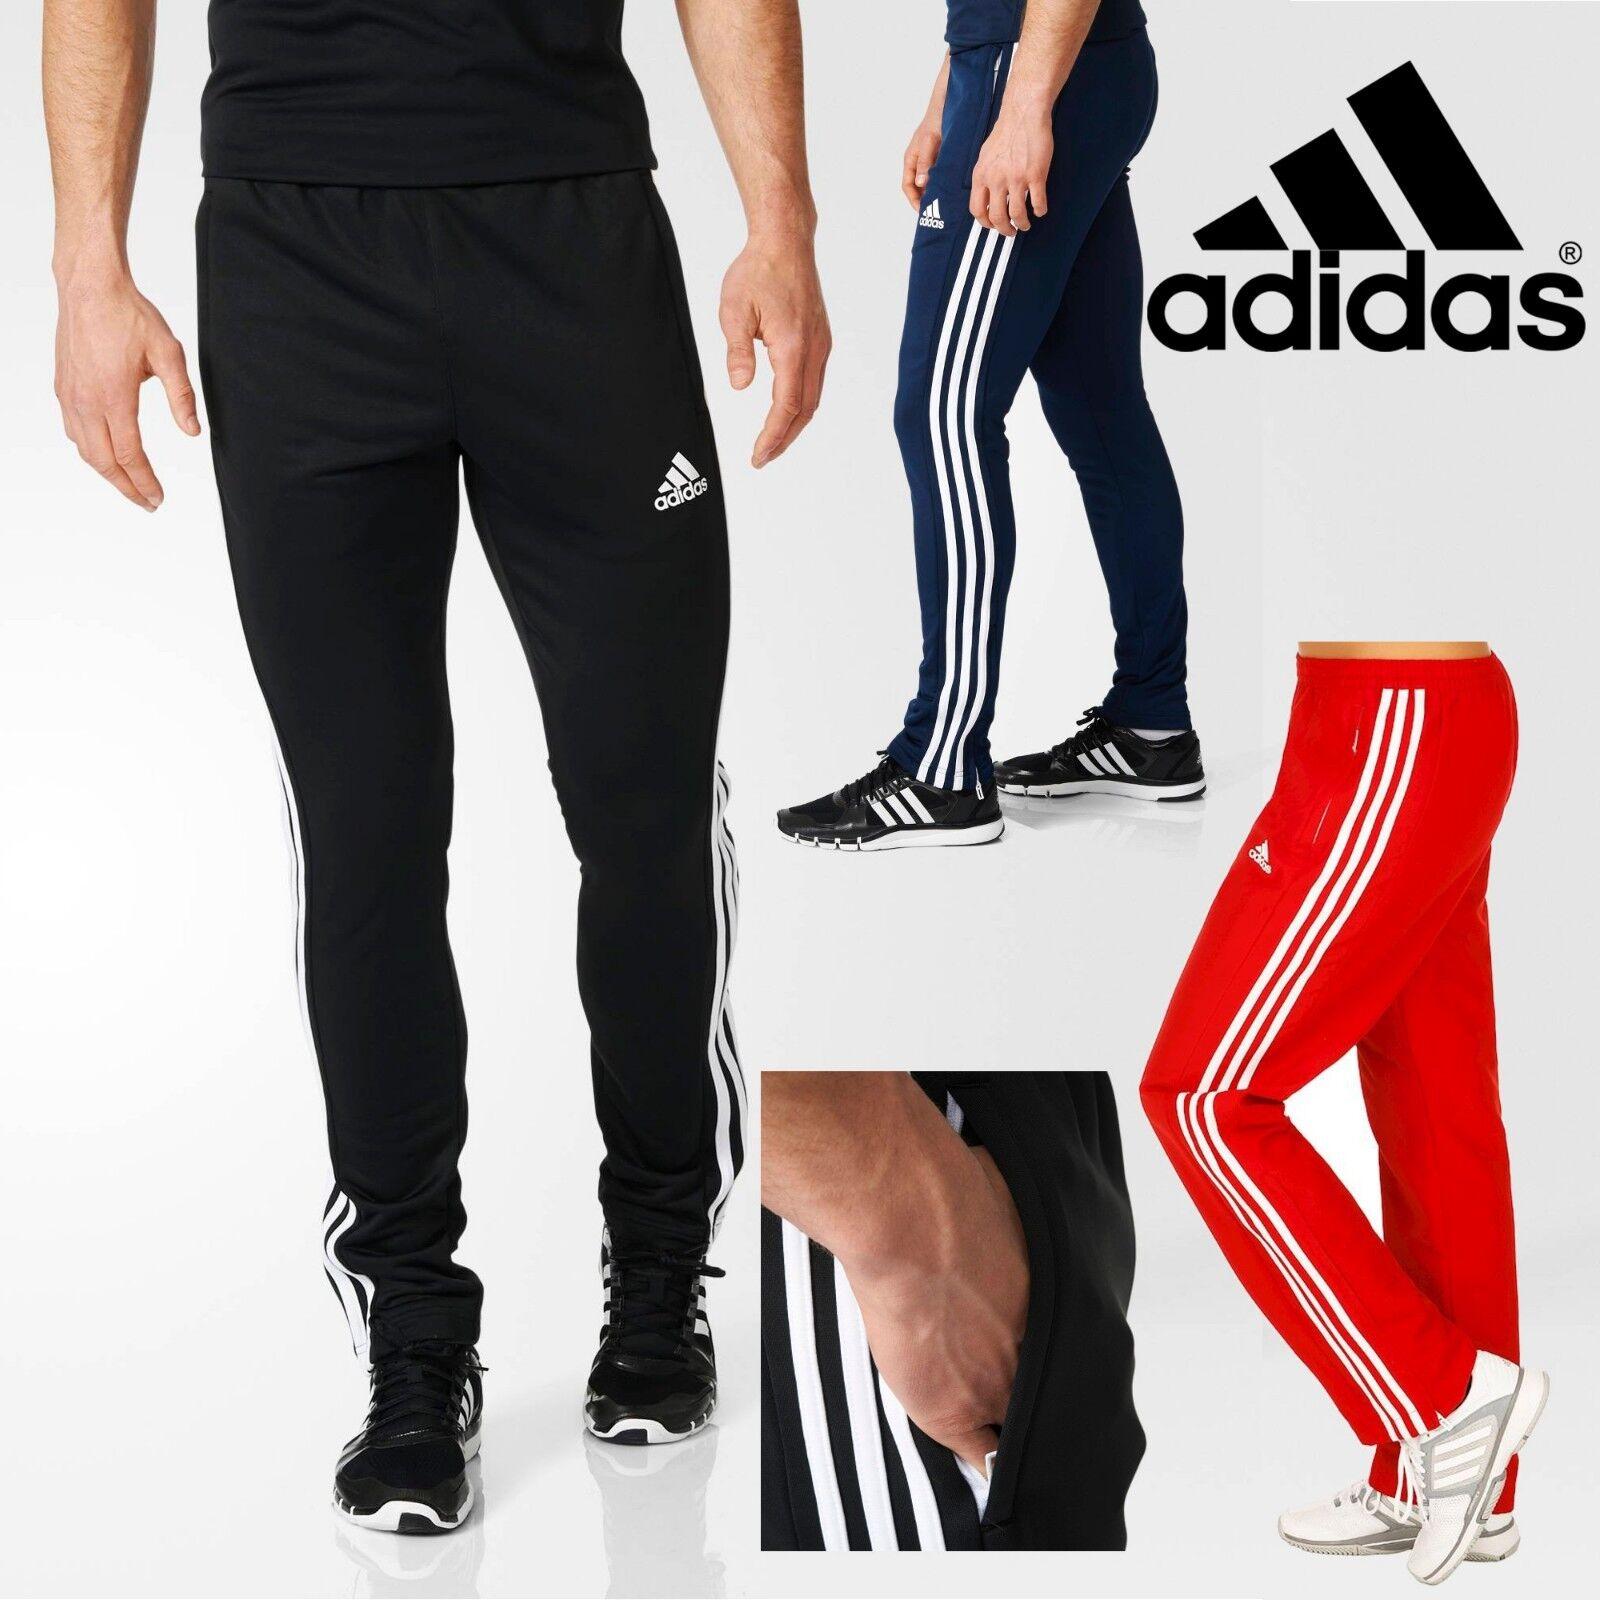 Running Sweat Sports Climalite Pants Bottoms T16 Gym Adidas